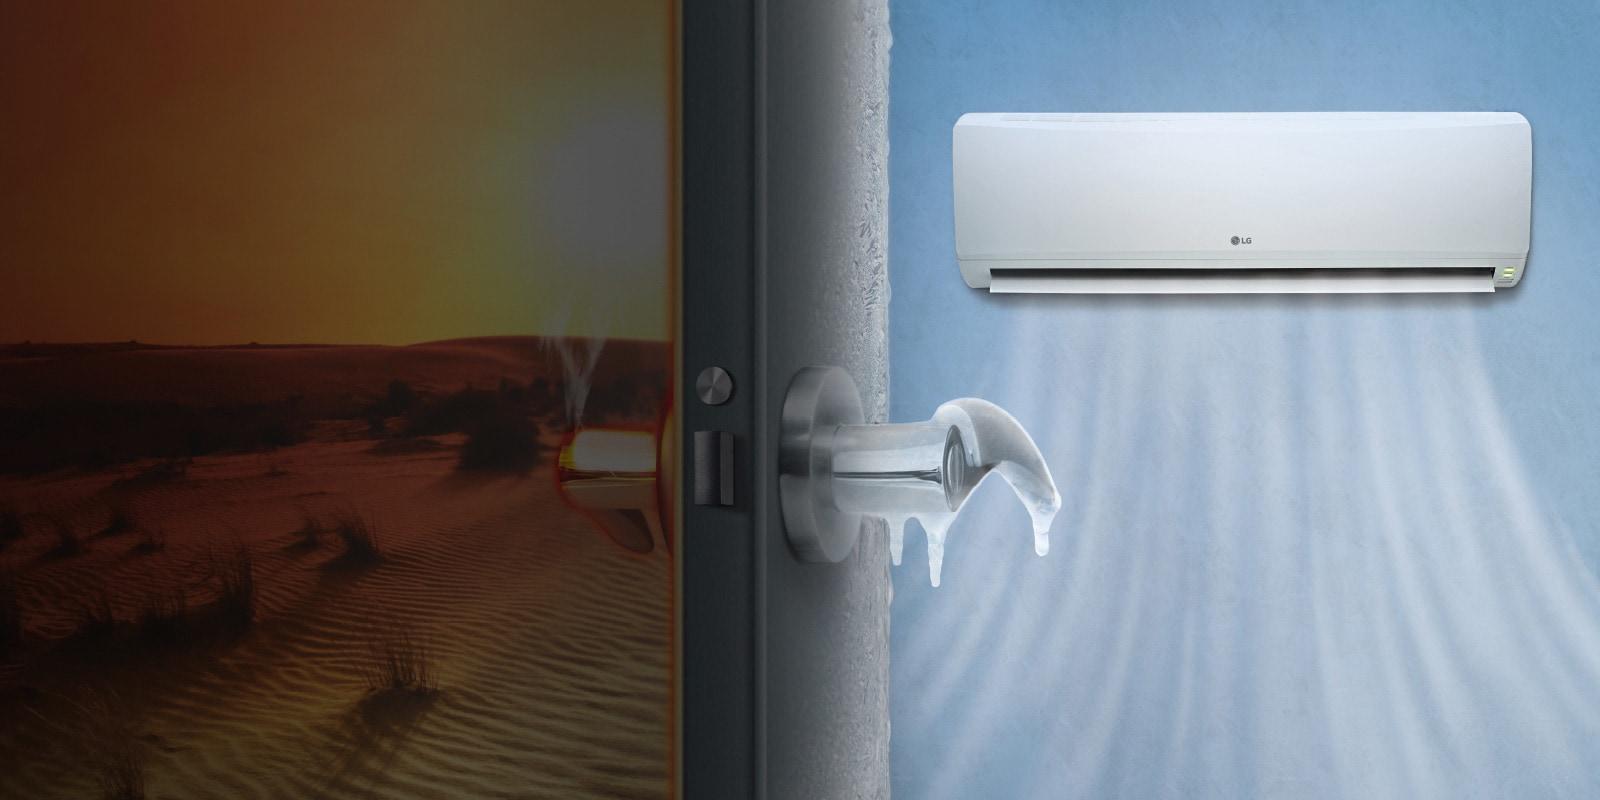 climatiseurs inverter conomie d 39 nergie et confort lg tunisie. Black Bedroom Furniture Sets. Home Design Ideas